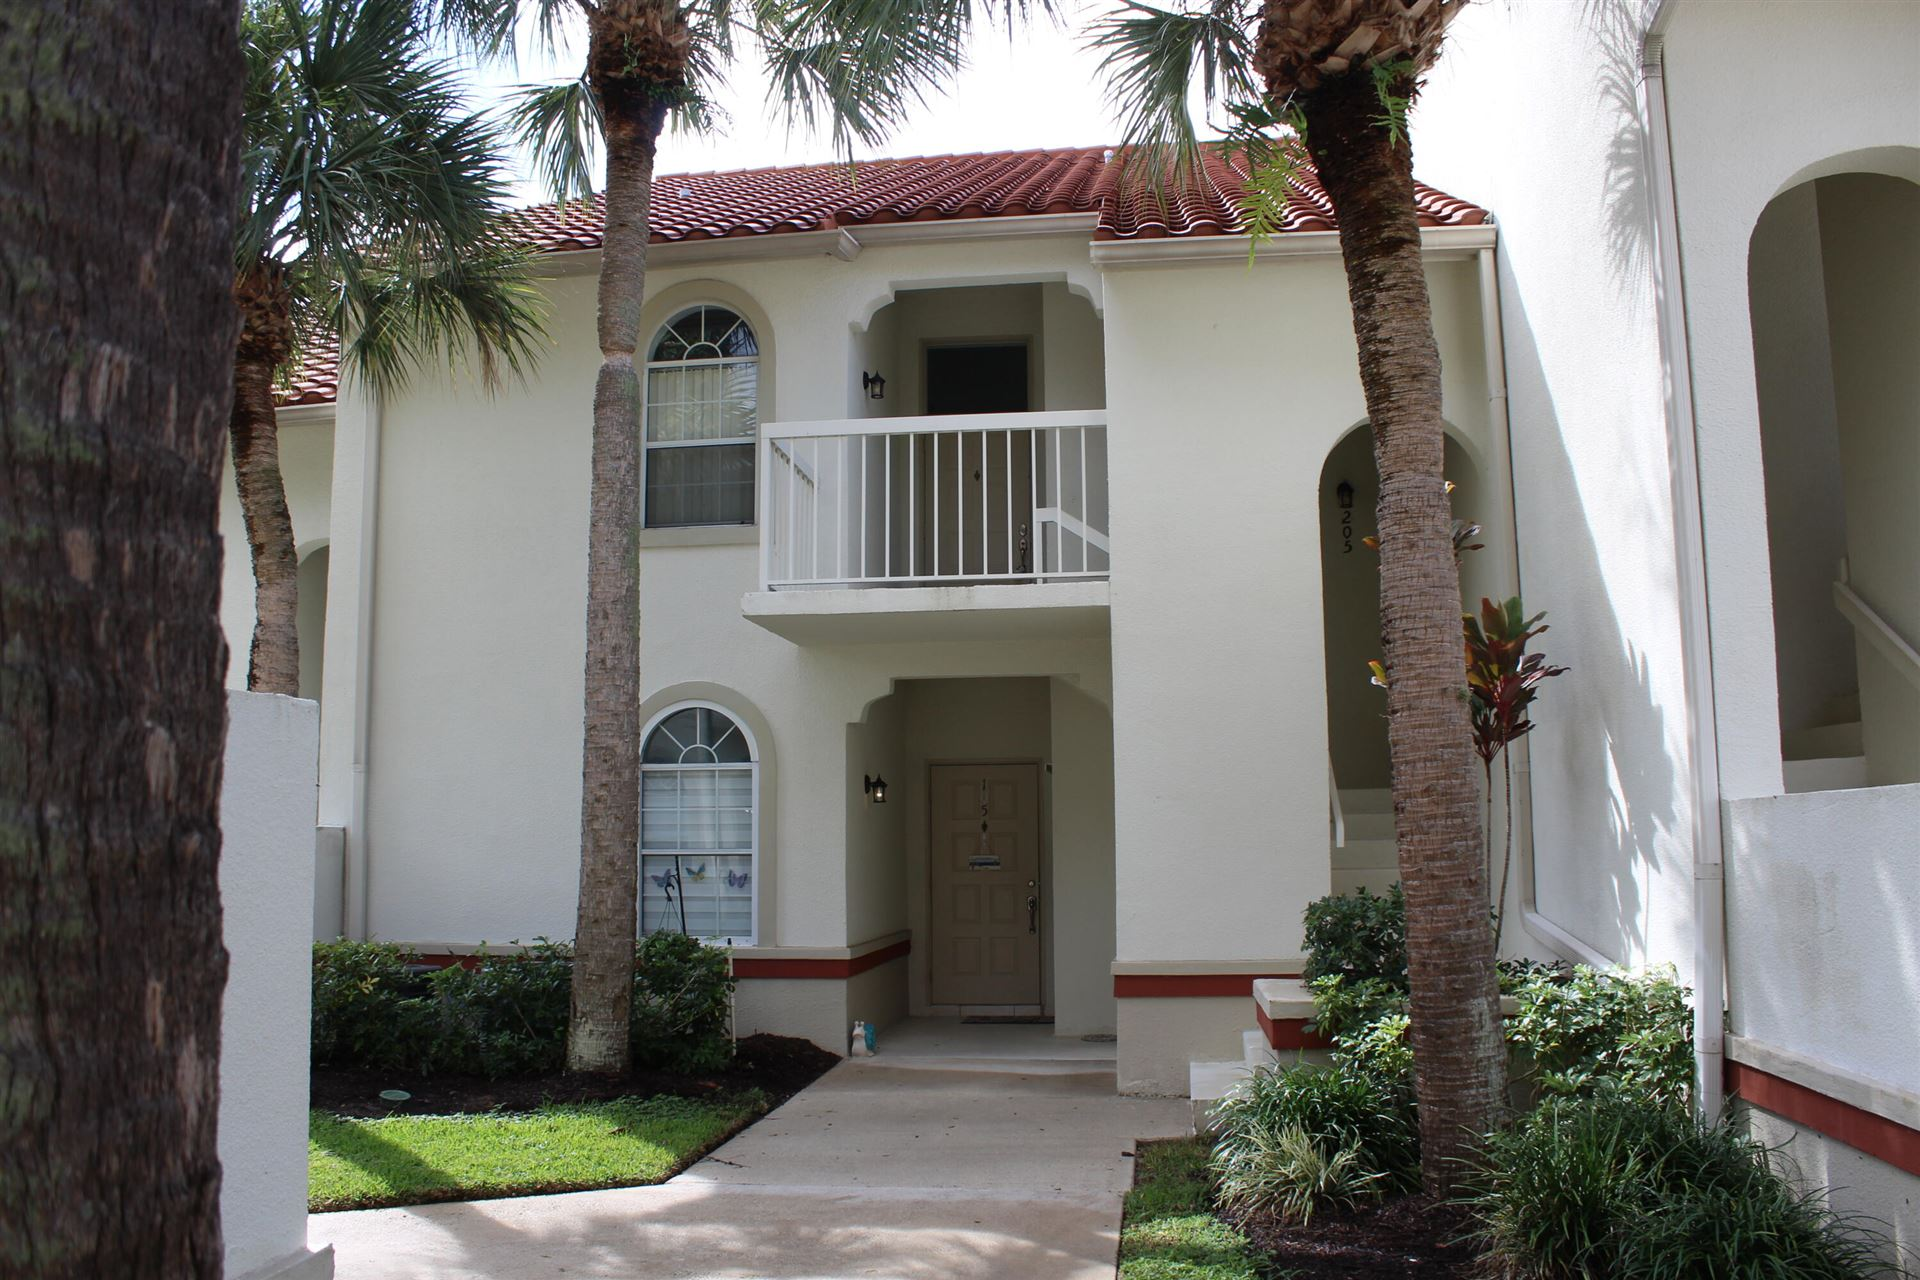 Photo of 205 Cypress Point Dr Drive #205, Palm Beach Gardens, FL 33418 (MLS # RX-10752033)